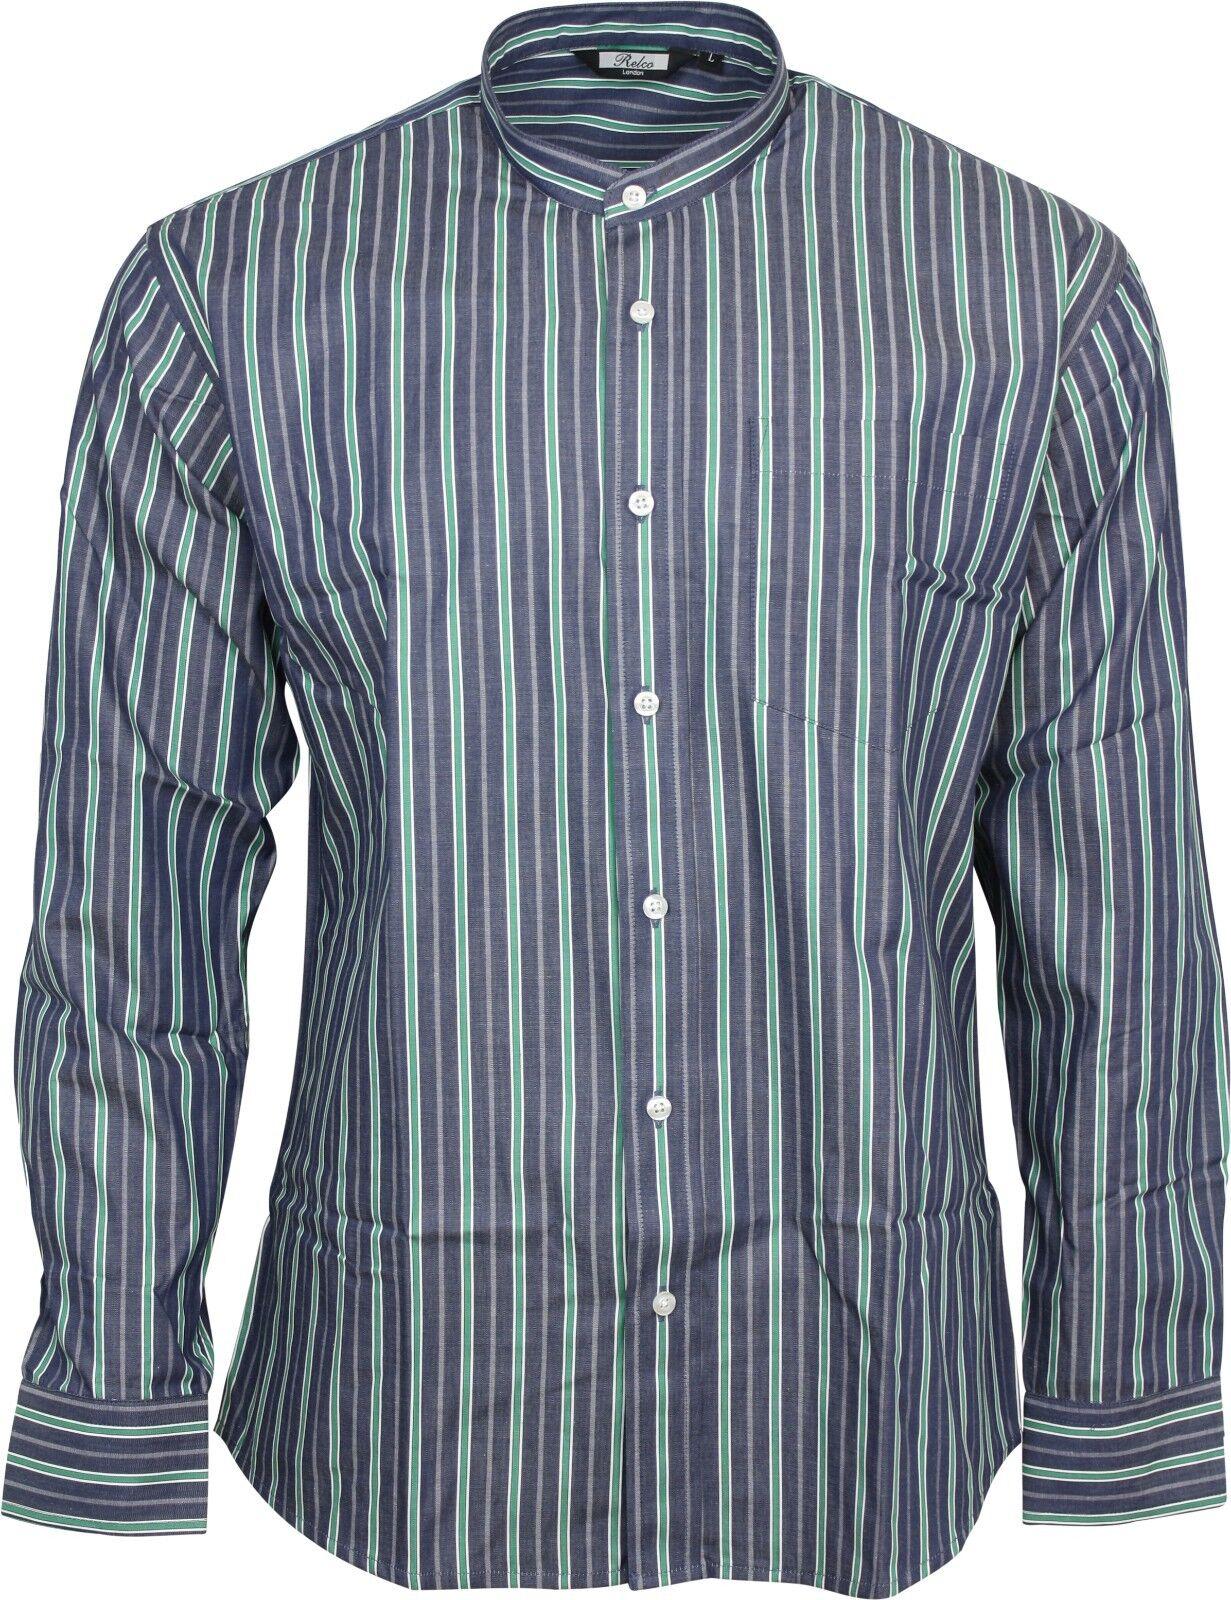 a0783f4d9548c Relco Mens Classic bluee Green Long Sleeved Grandad 50s 60s Retro Shirt  Striped nuyaqy8657-Casual Shirts   Tops